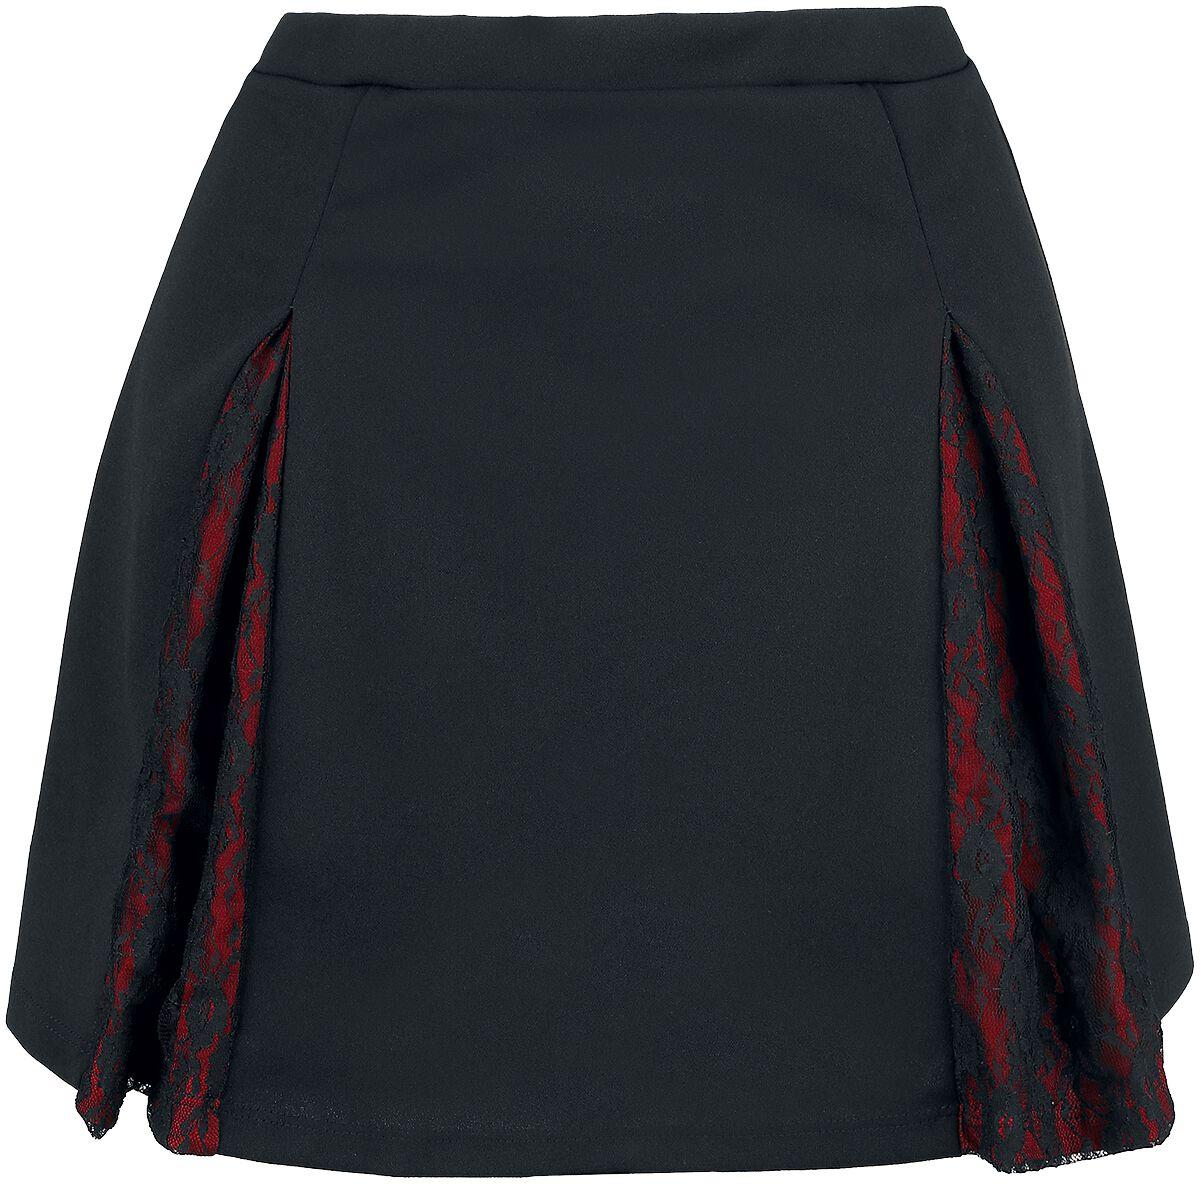 Outer Vision Skirt Margarita Kurzer Rock schwarz rot 10633-OV Woman's Skirt Margarita solid black